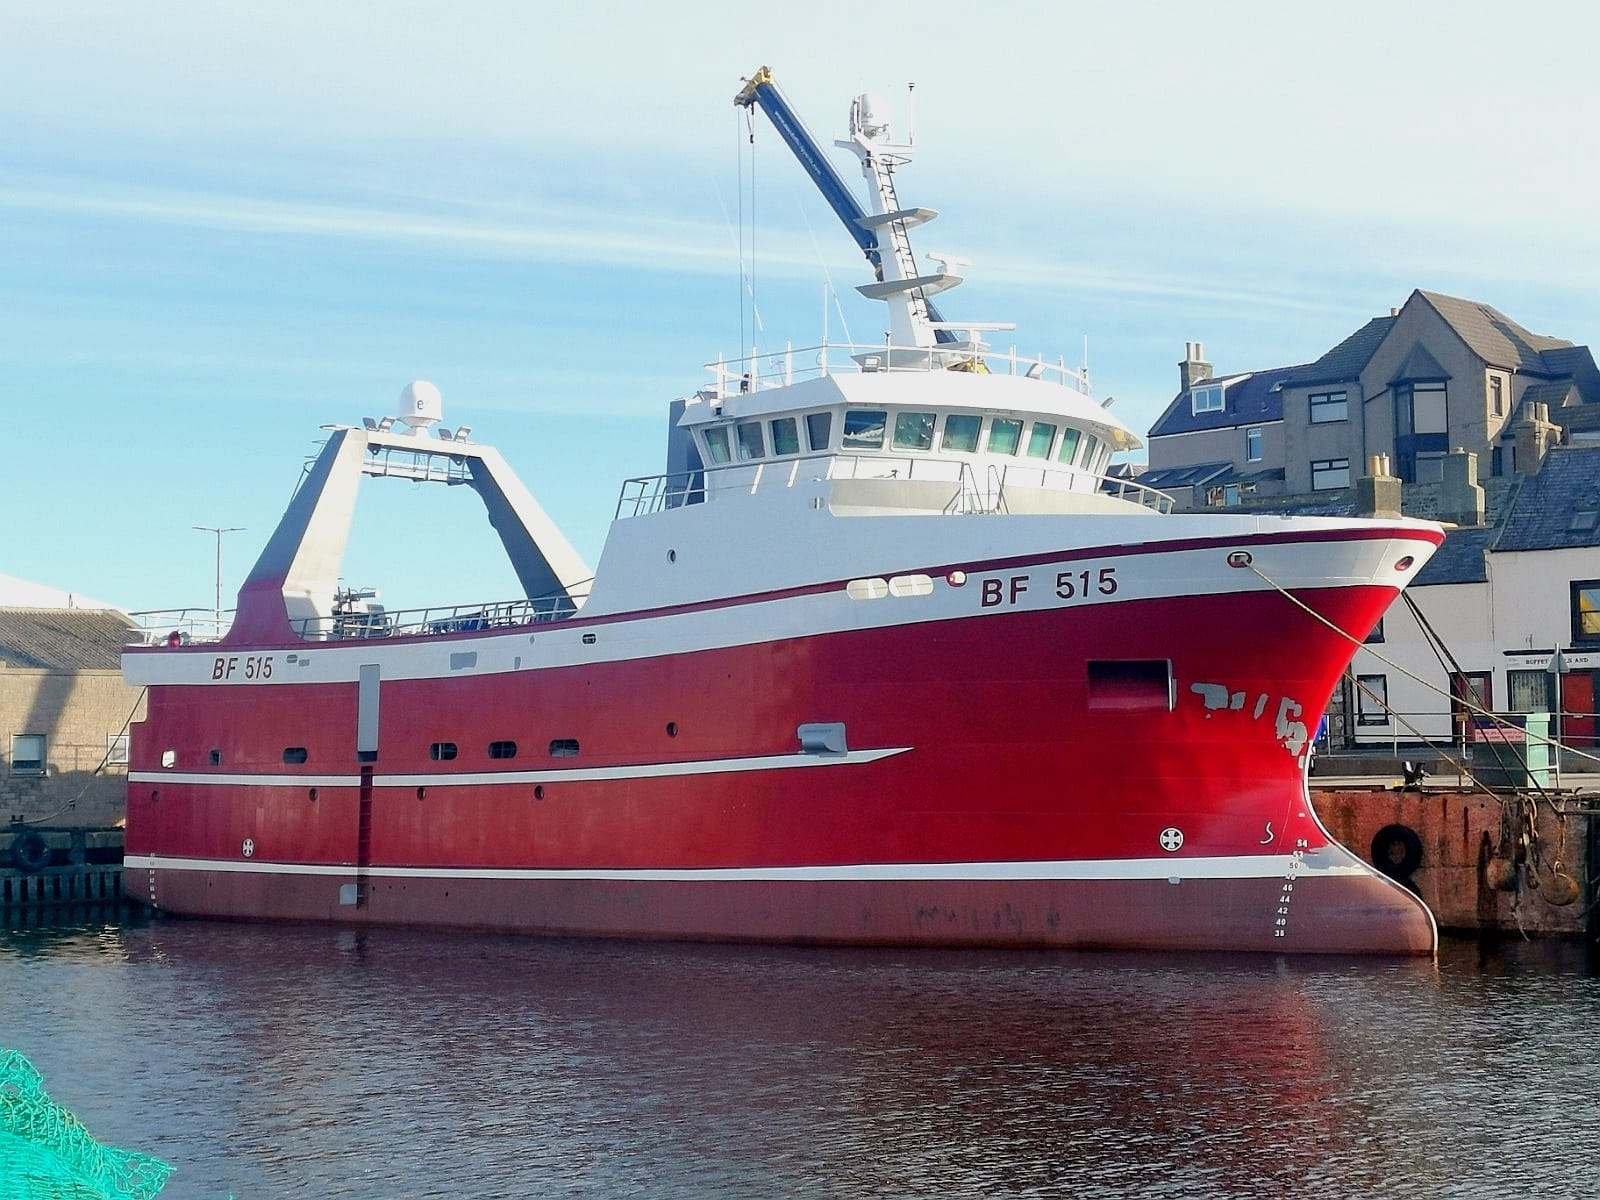 Starboard side of 33m fishing trawler